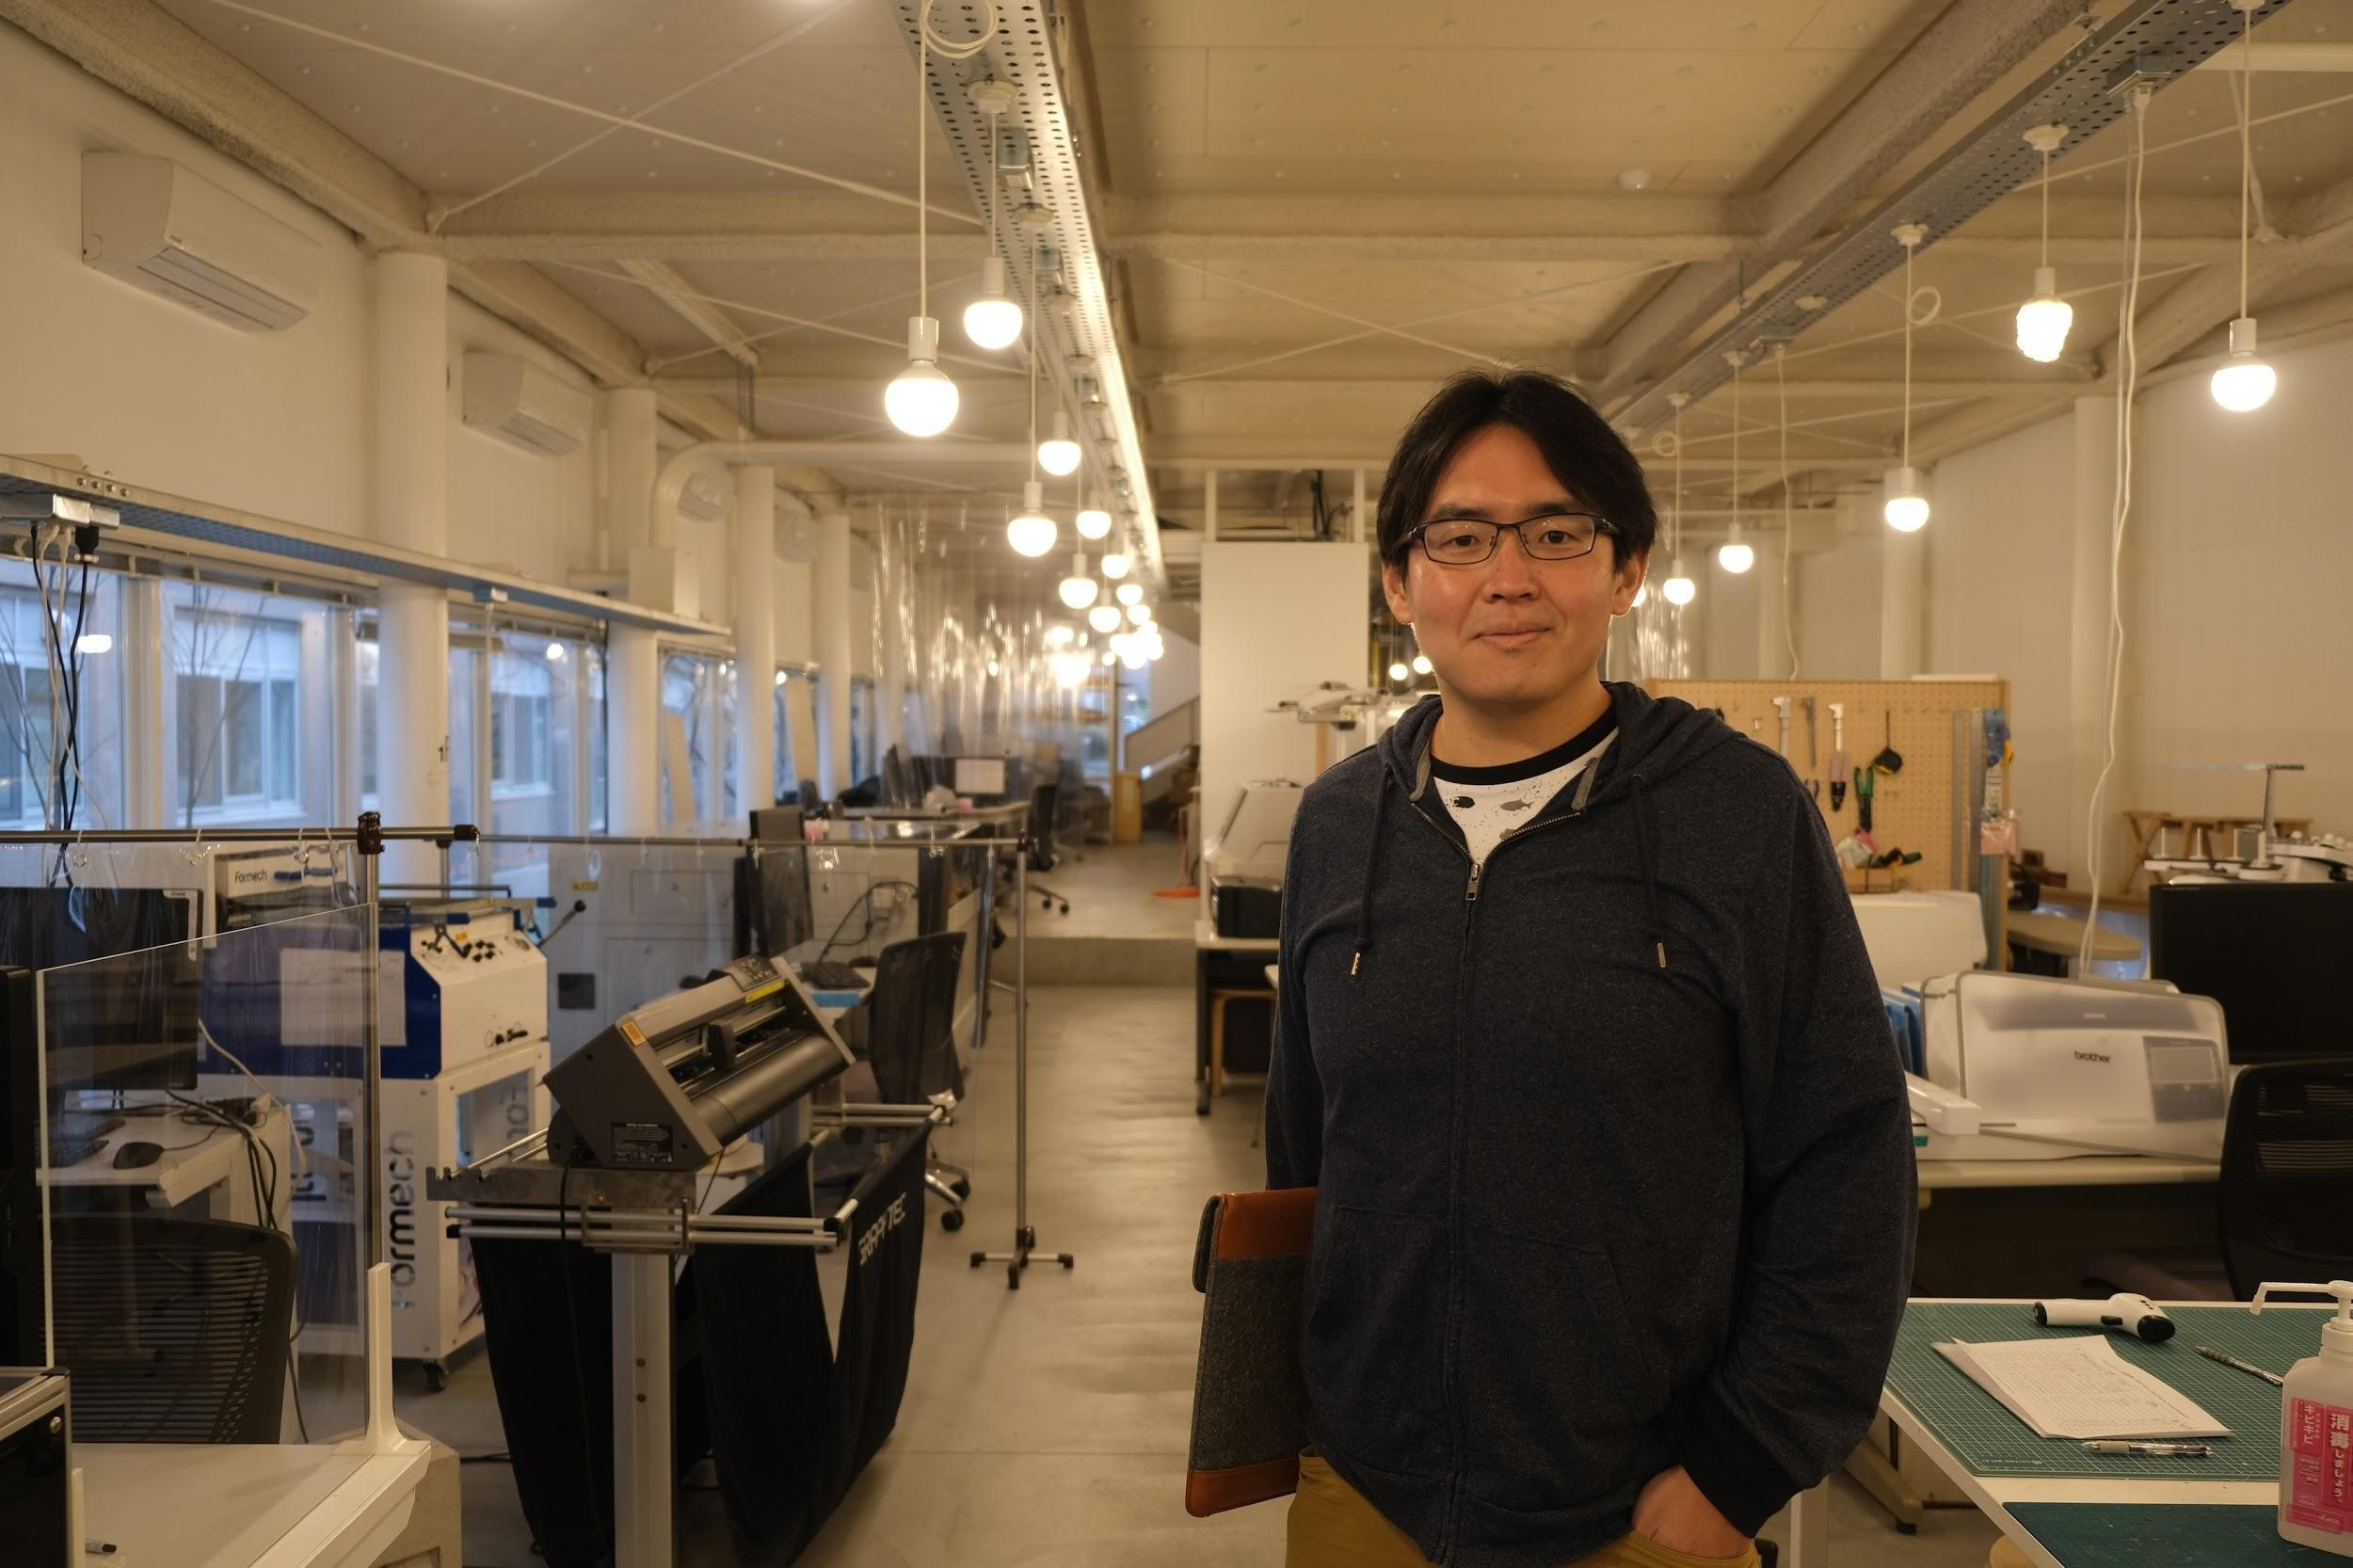 京都工芸繊維大学デザイン・建築学系 准教授 Sushi Suzuki